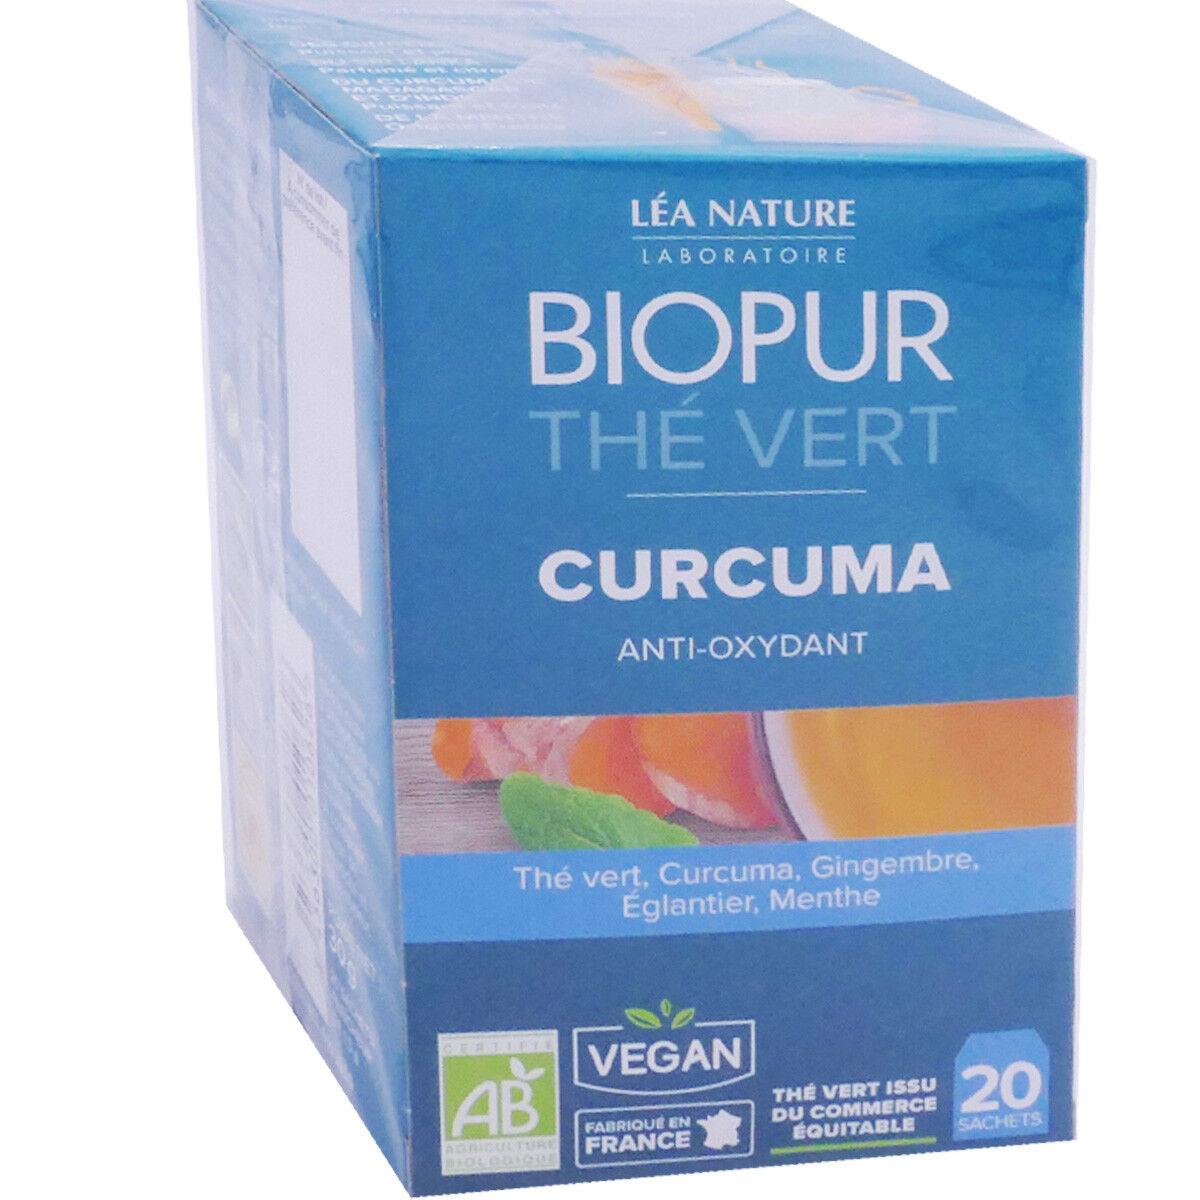 Biopur the vert curcuma 20 sachets